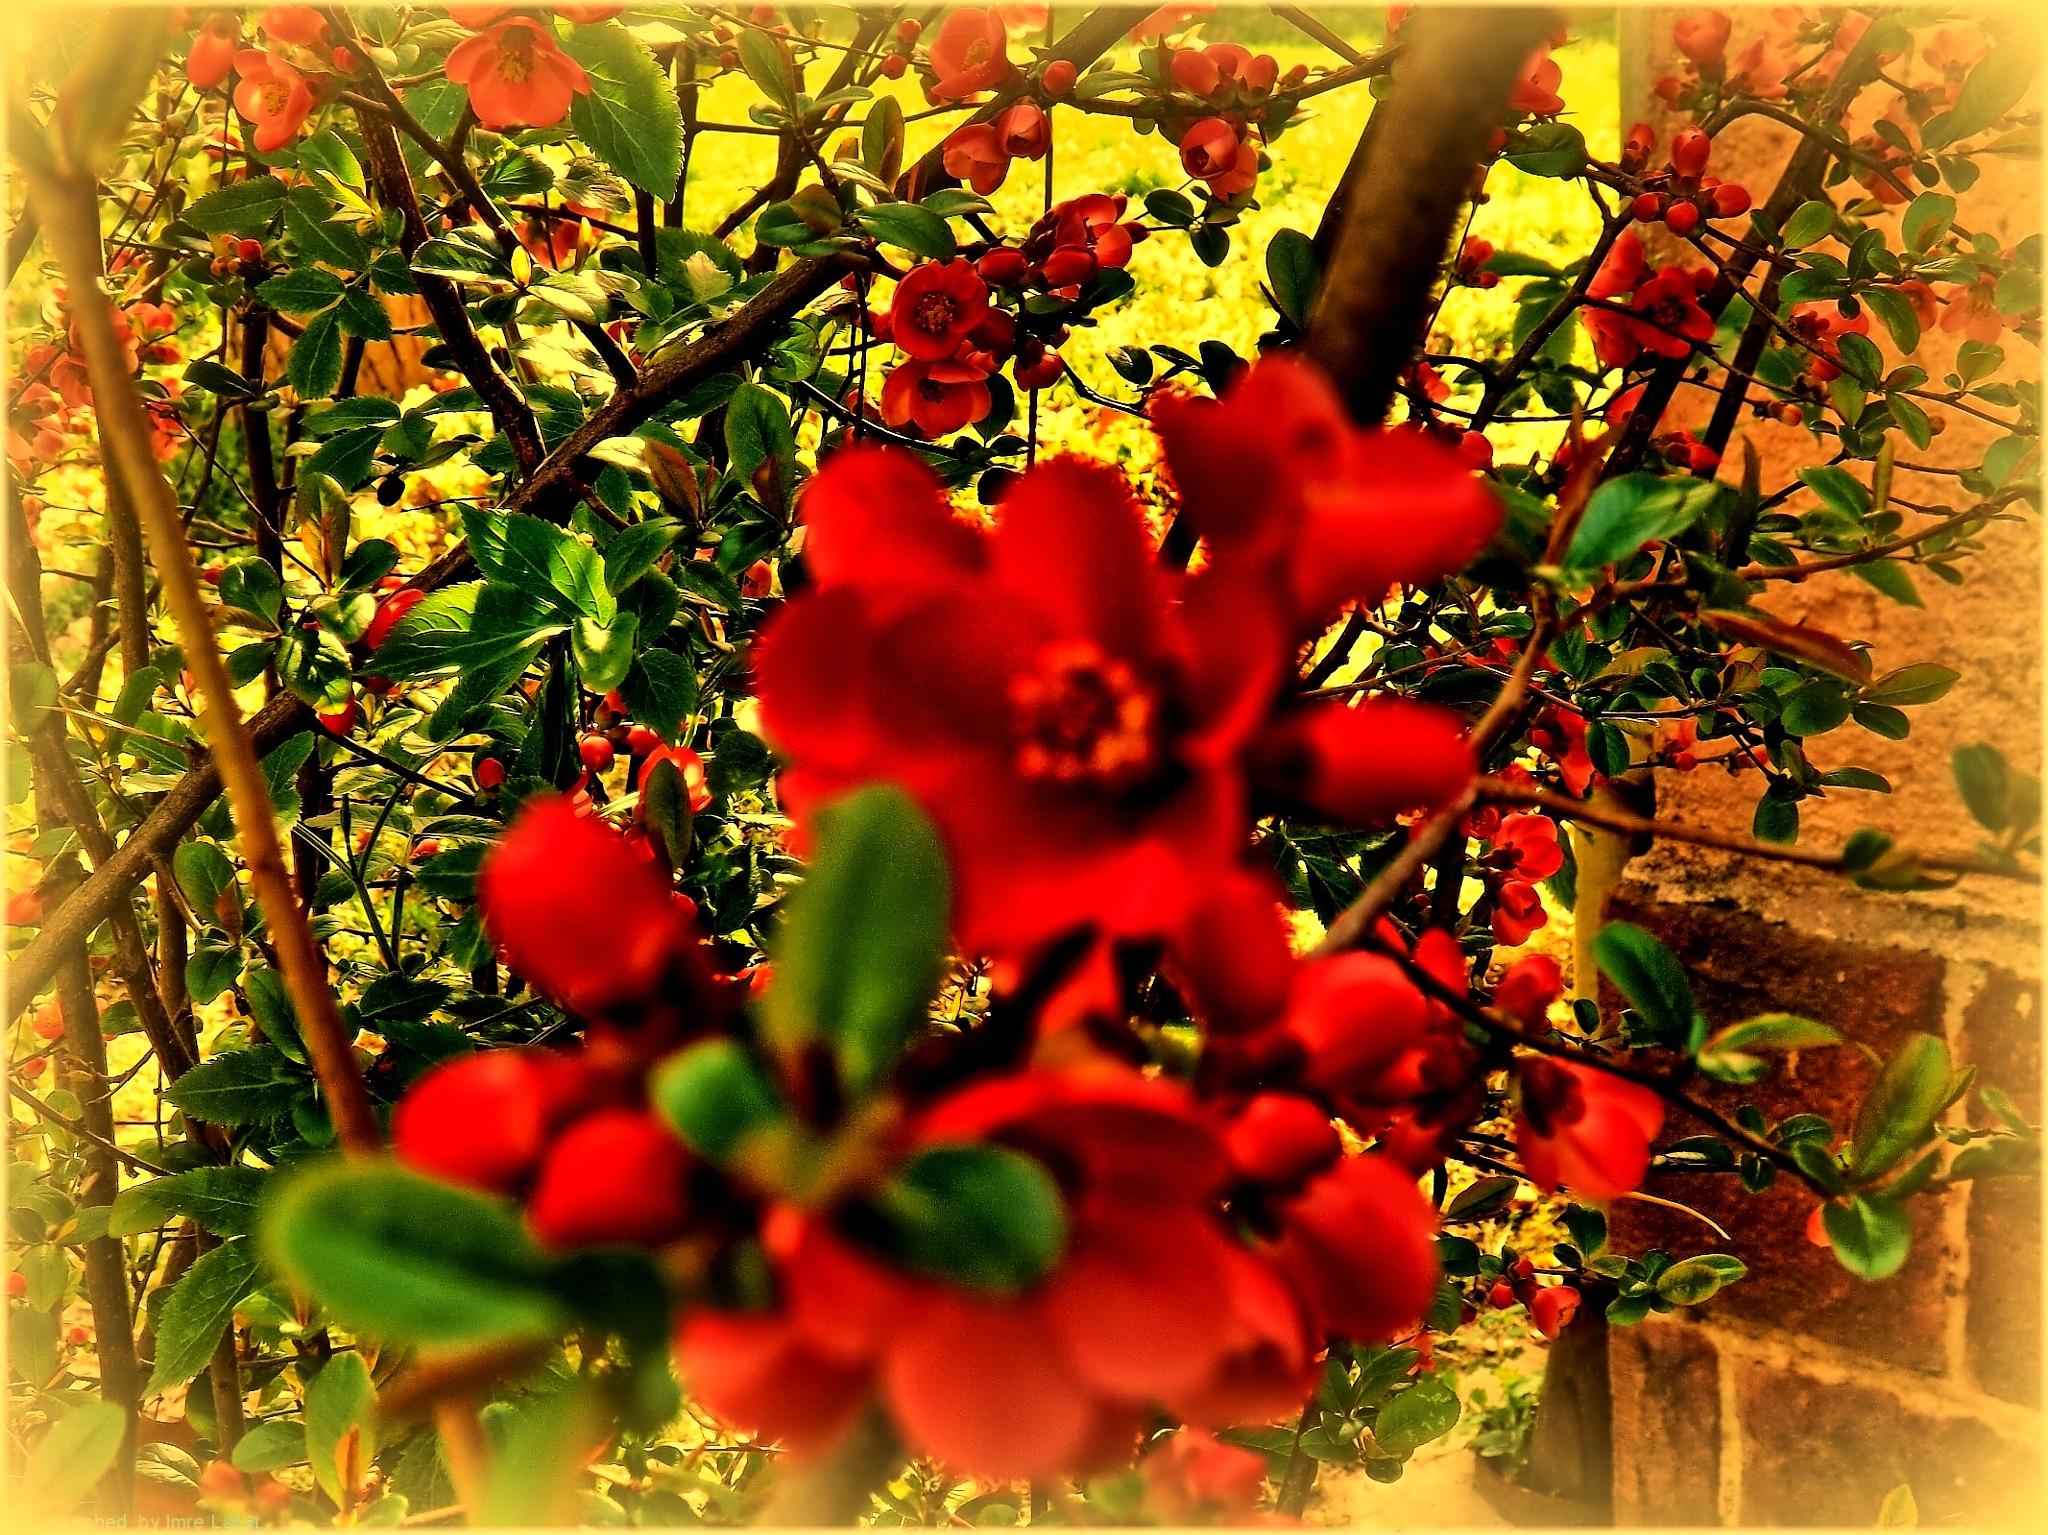 Flowers by Imre Lakat